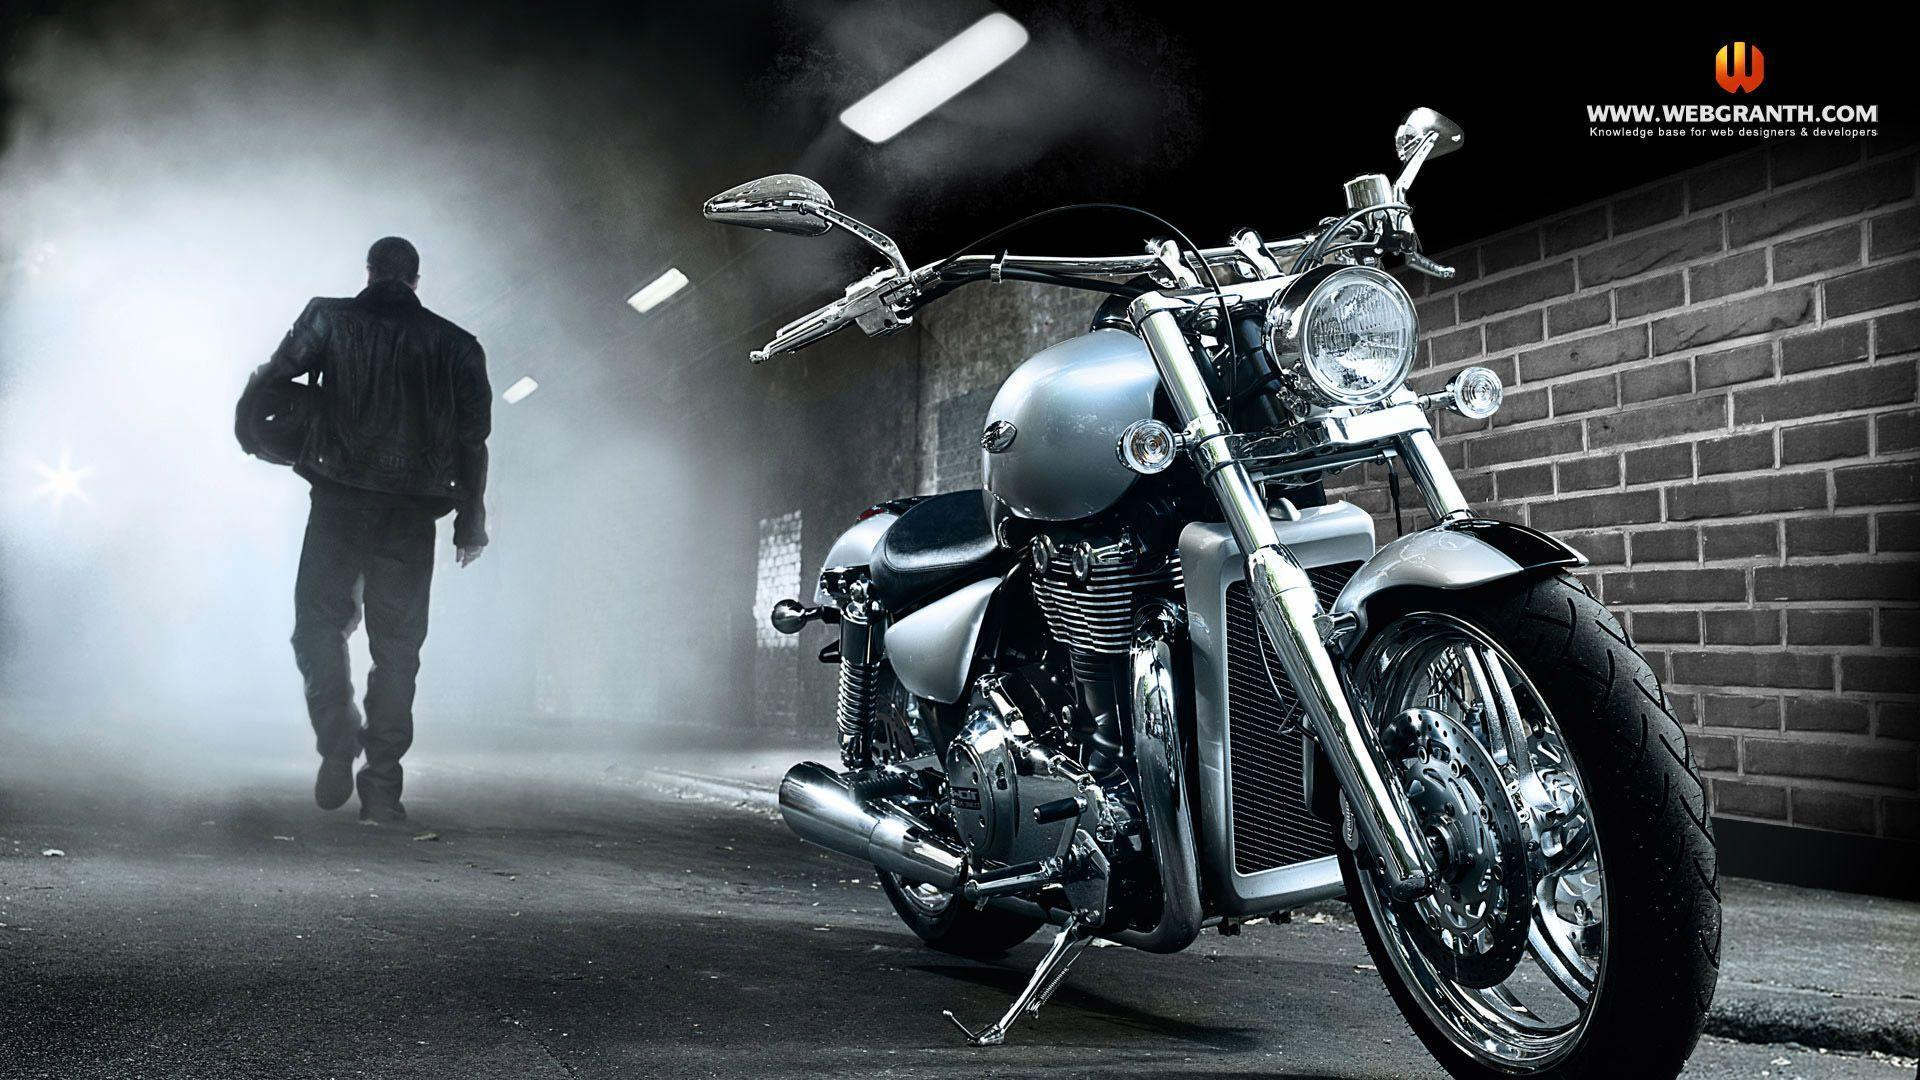 Luxury Motorcycle Hd Wallpapers: Biker Wallpapers